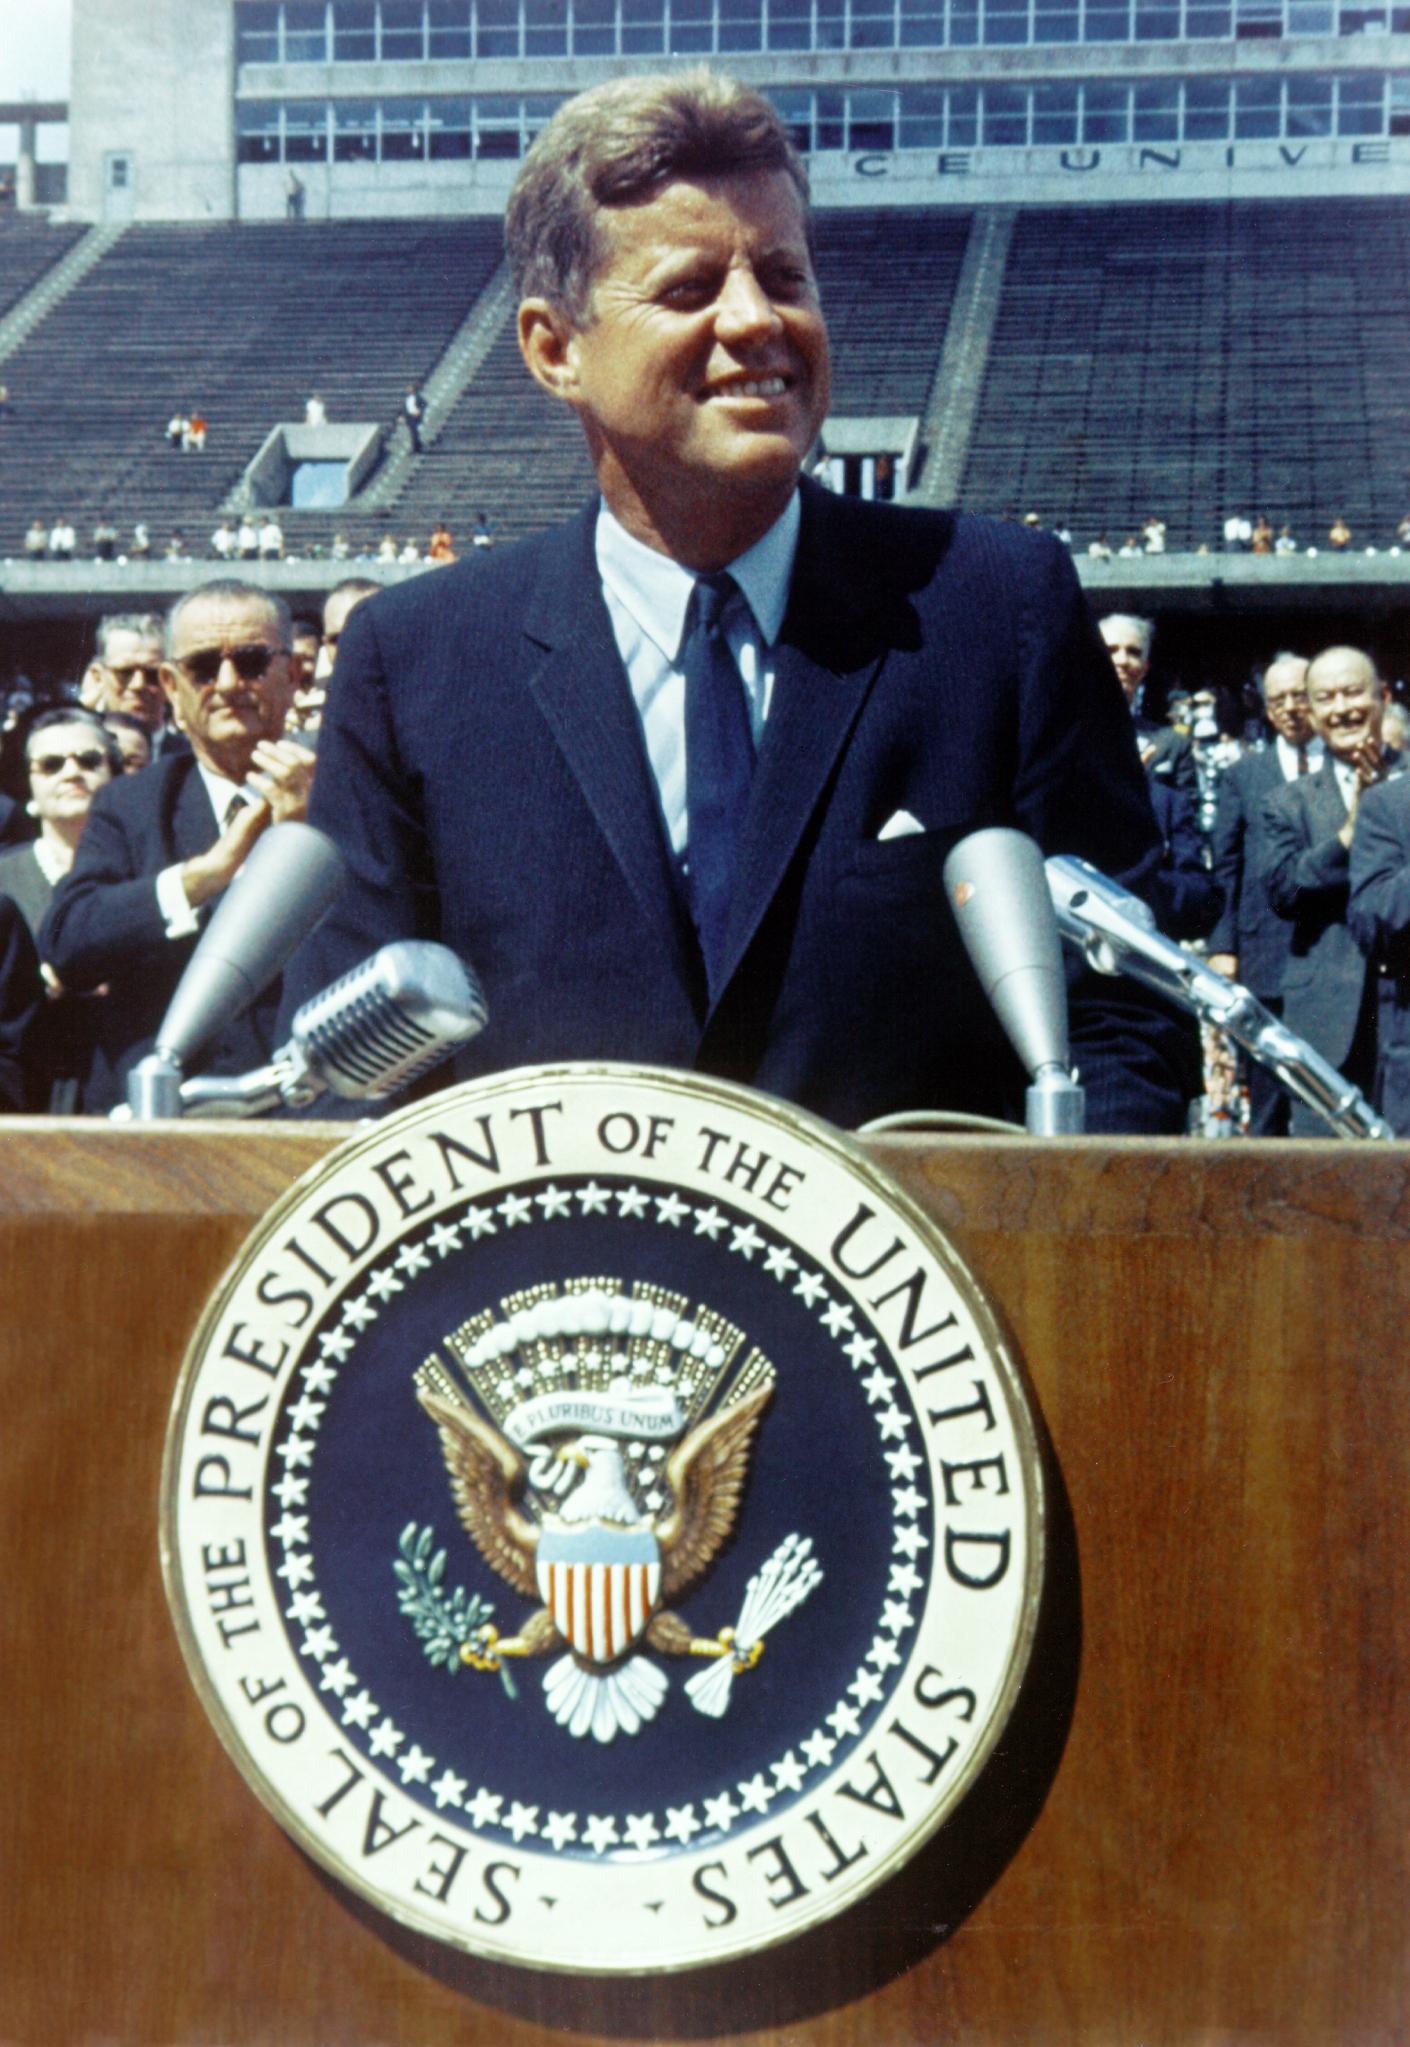 John_F._Kennedy_speaks_at_Rice_University